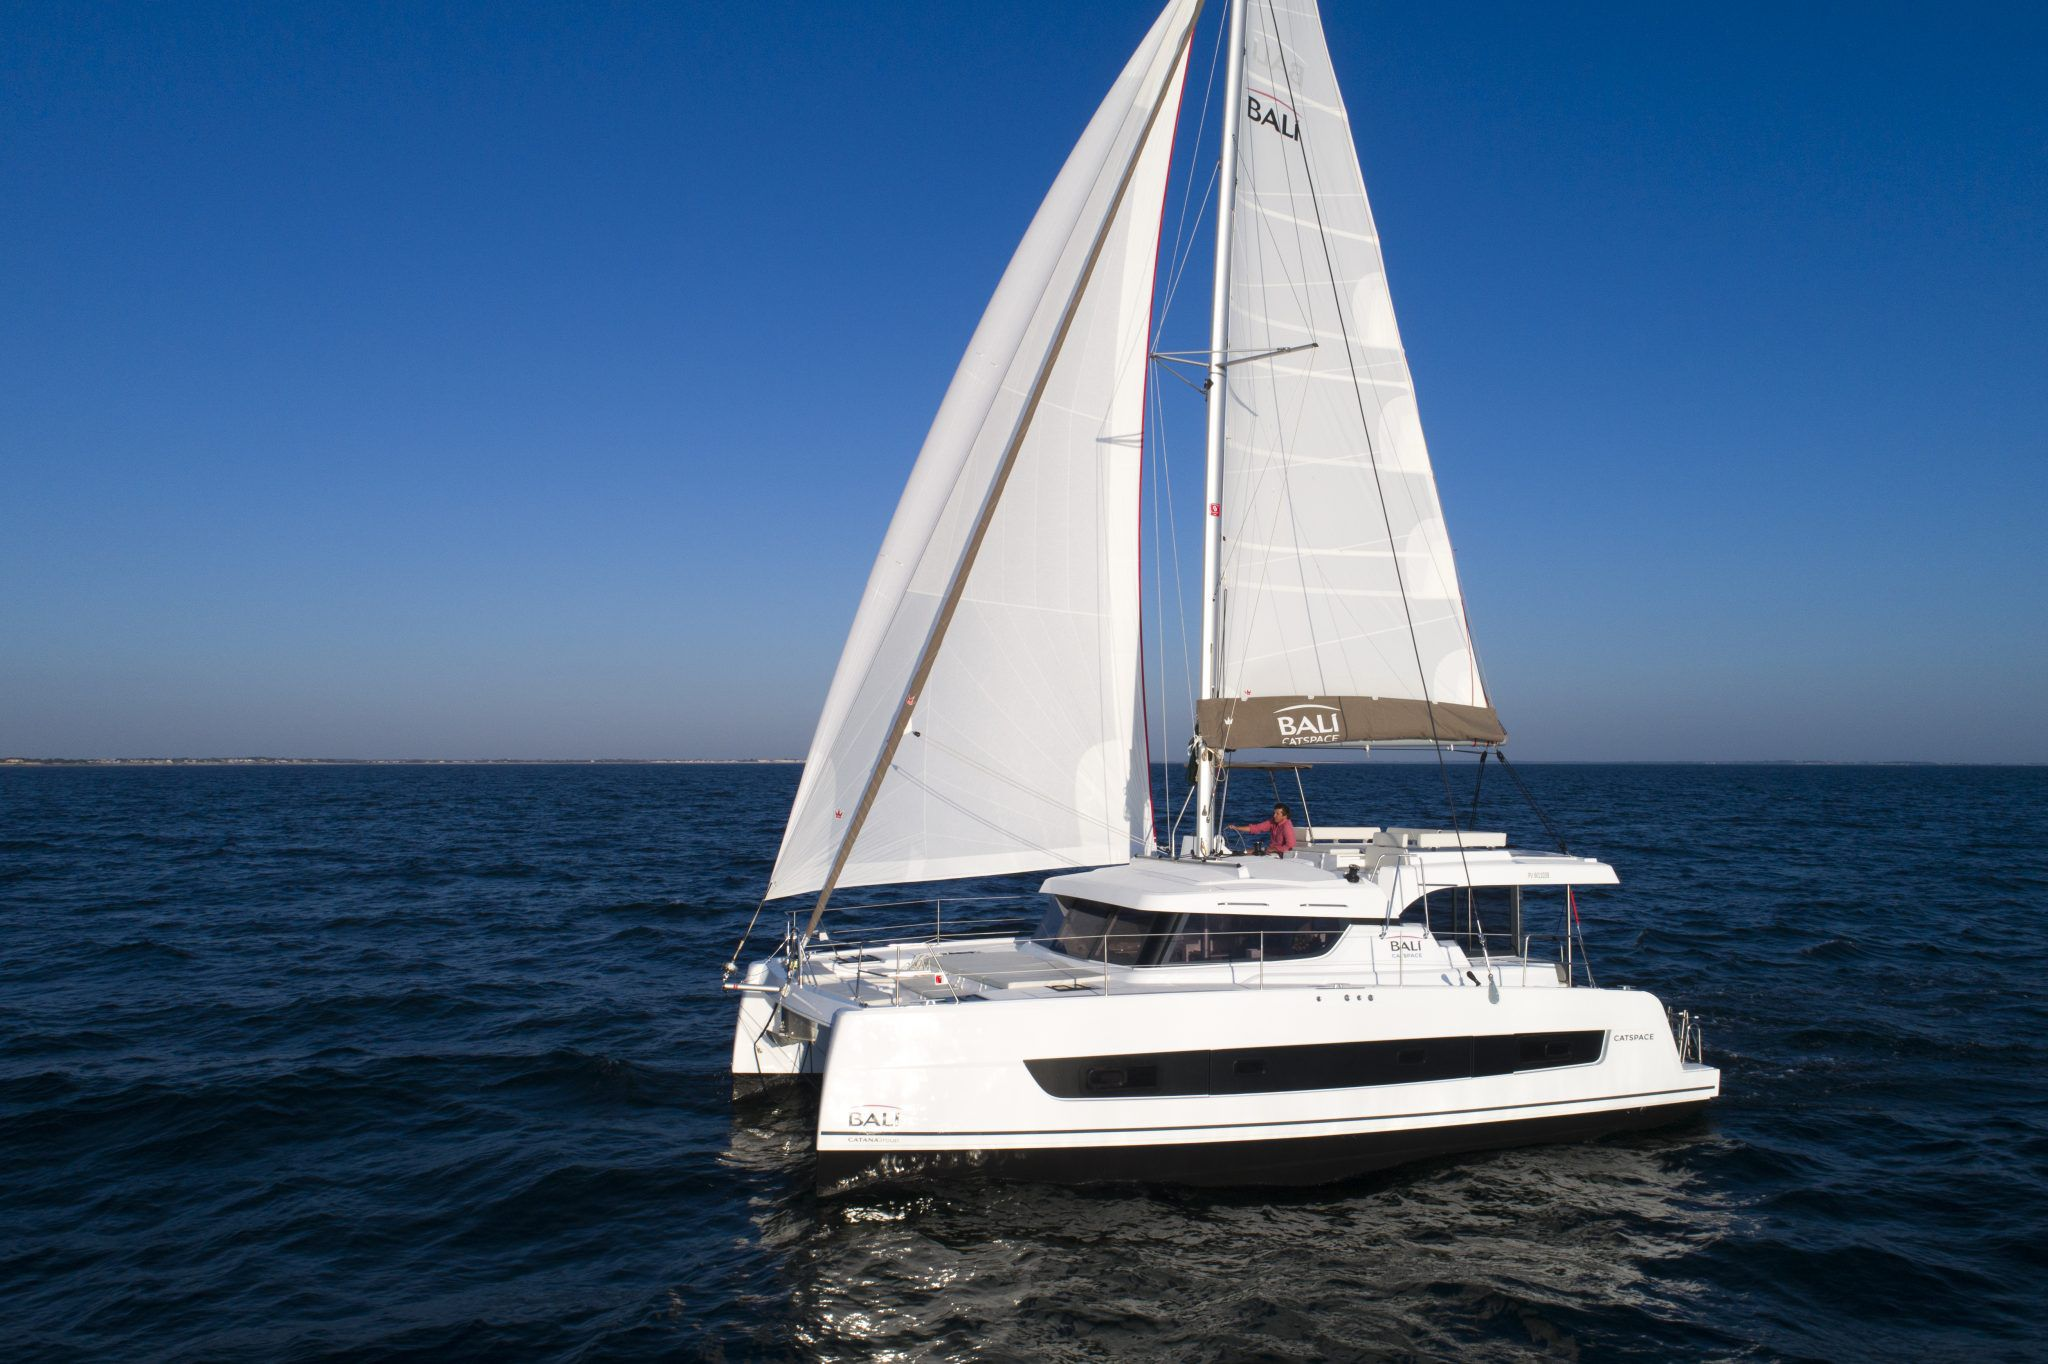 Bali Catspace Prestige - Catamaran for Charter in Greece